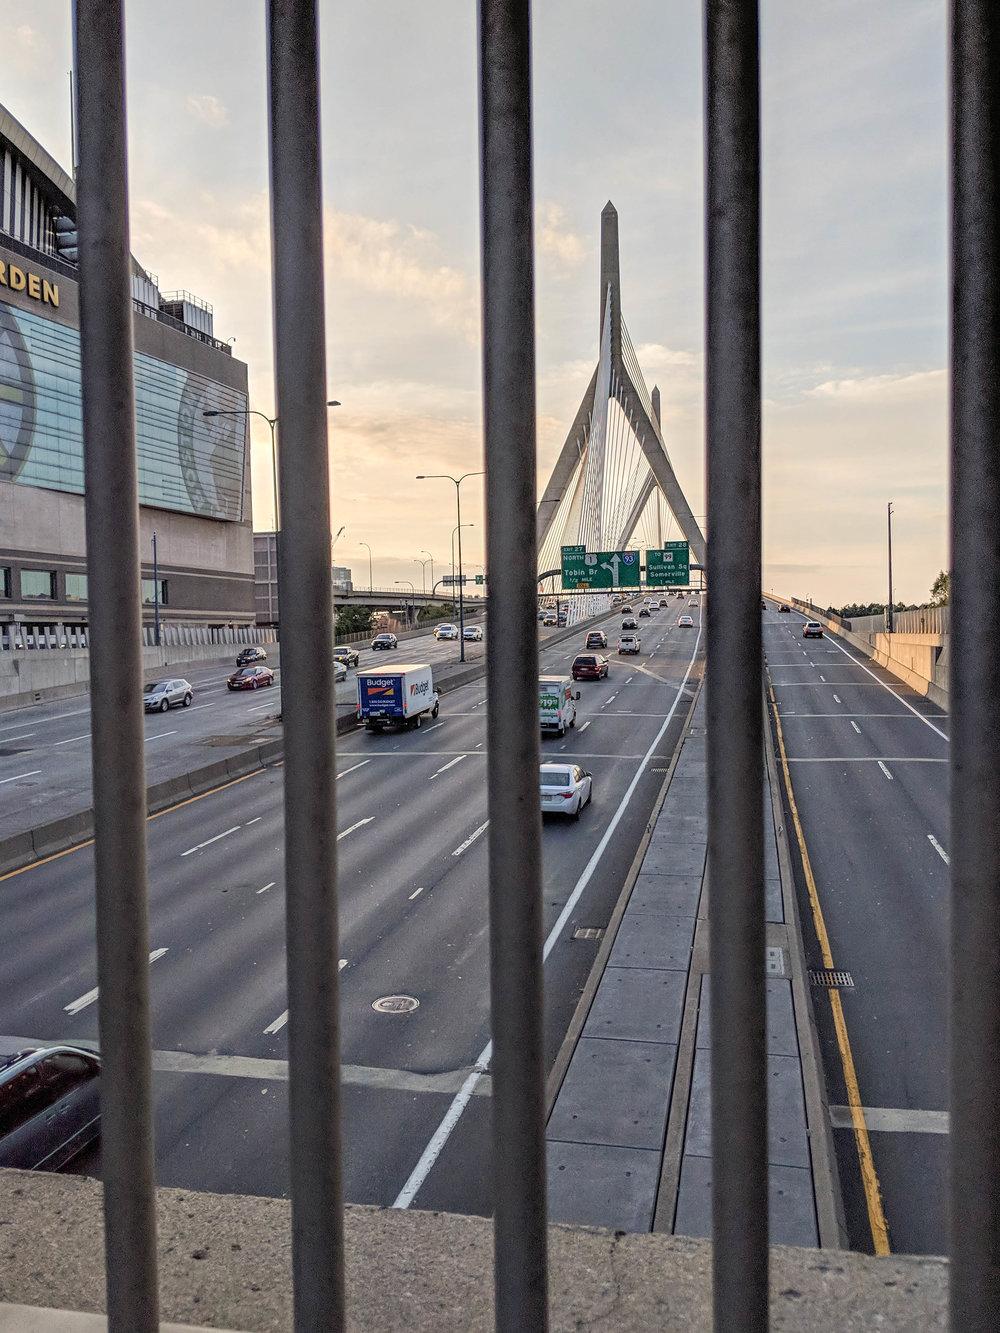 bri rinehart; photography; zakim bridge; boston